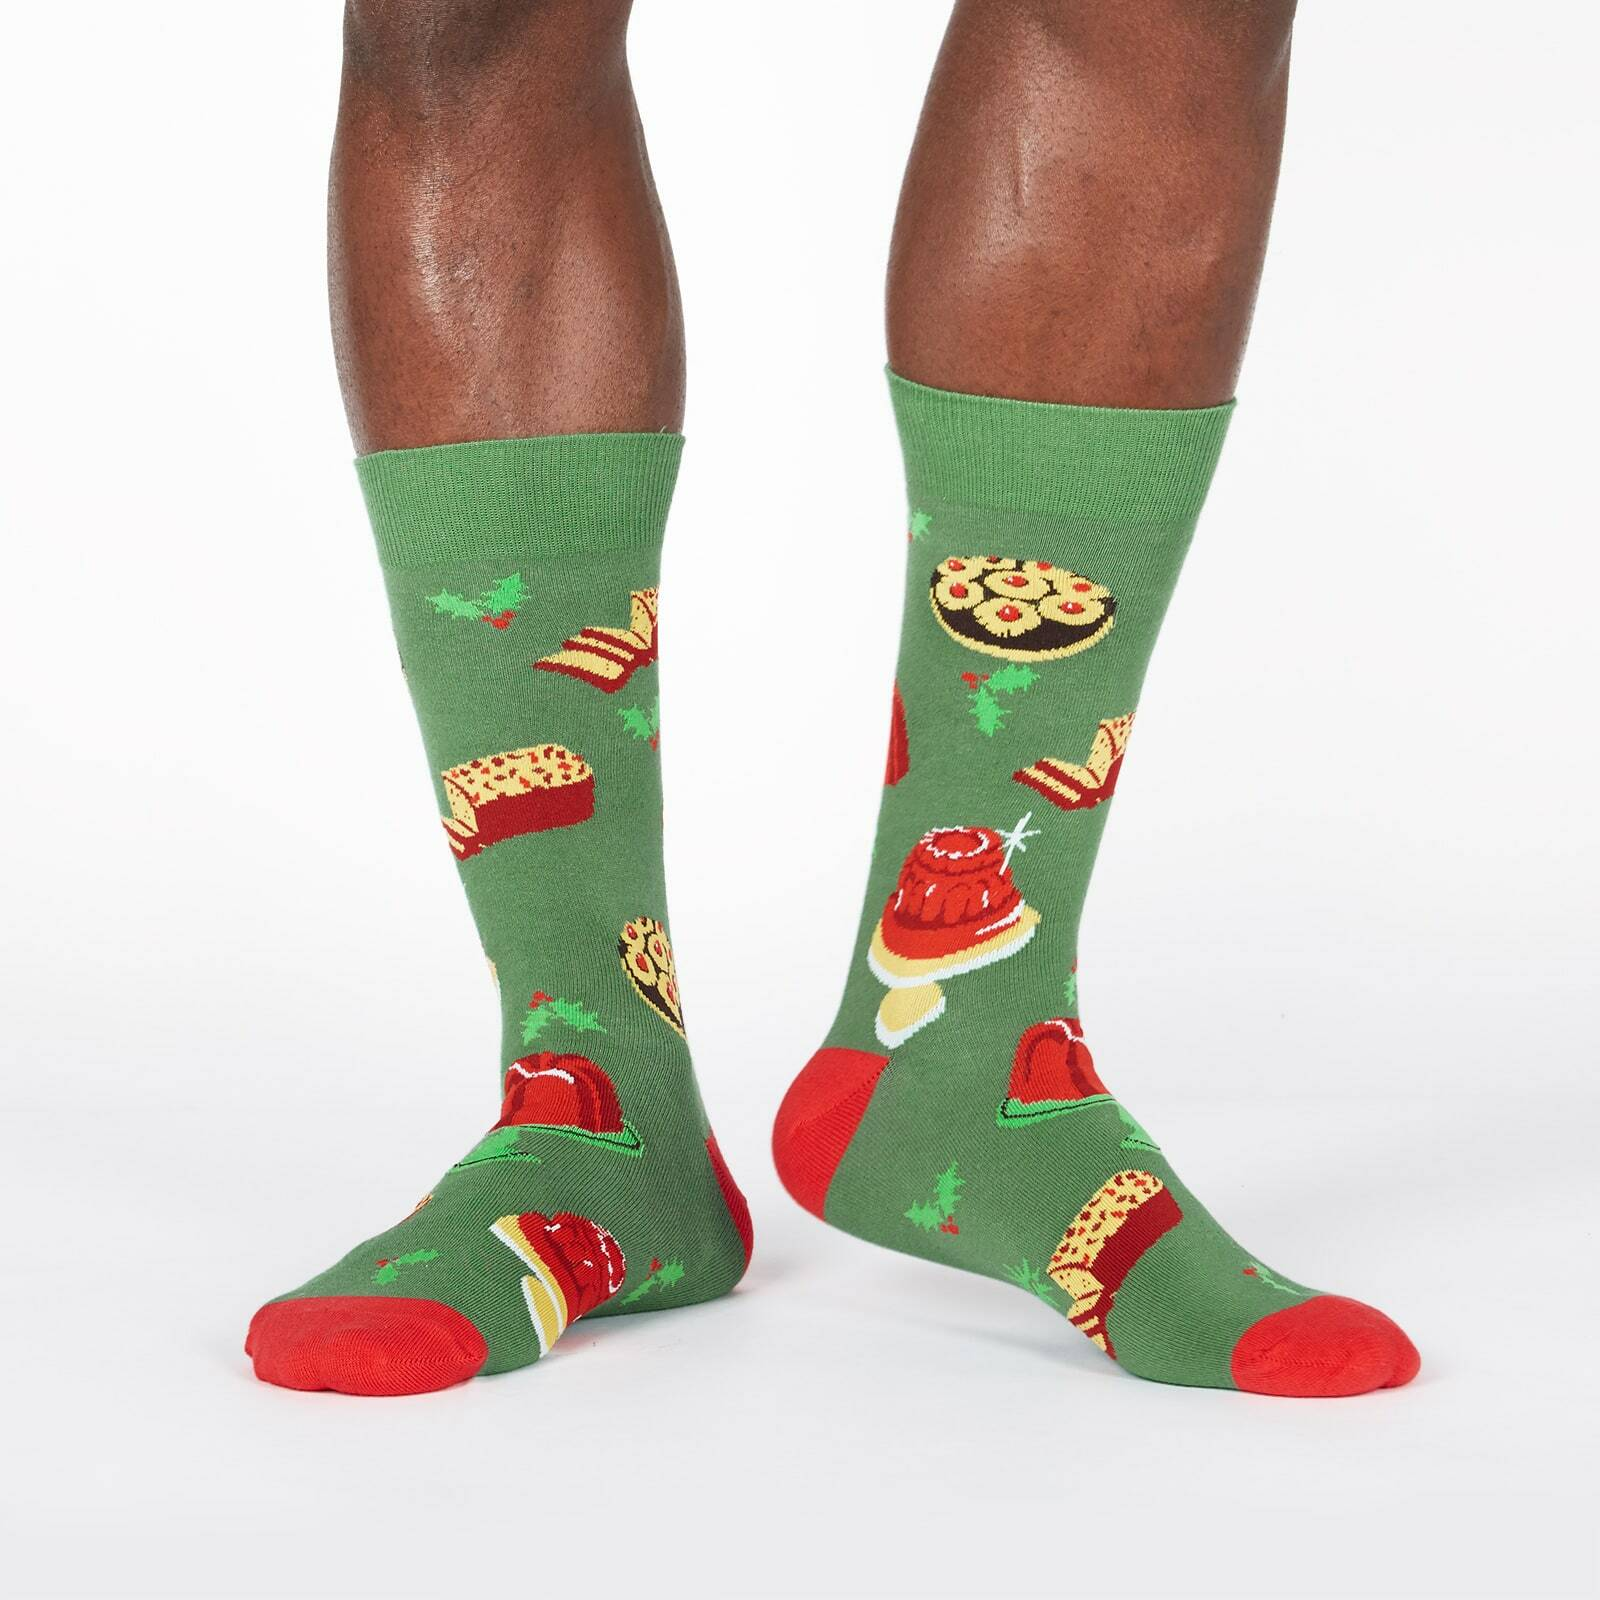 model wearing Getting Jiggly with It - Gelatin Dessert Christmas Holiday Dinner Crew Socks Green - Men's